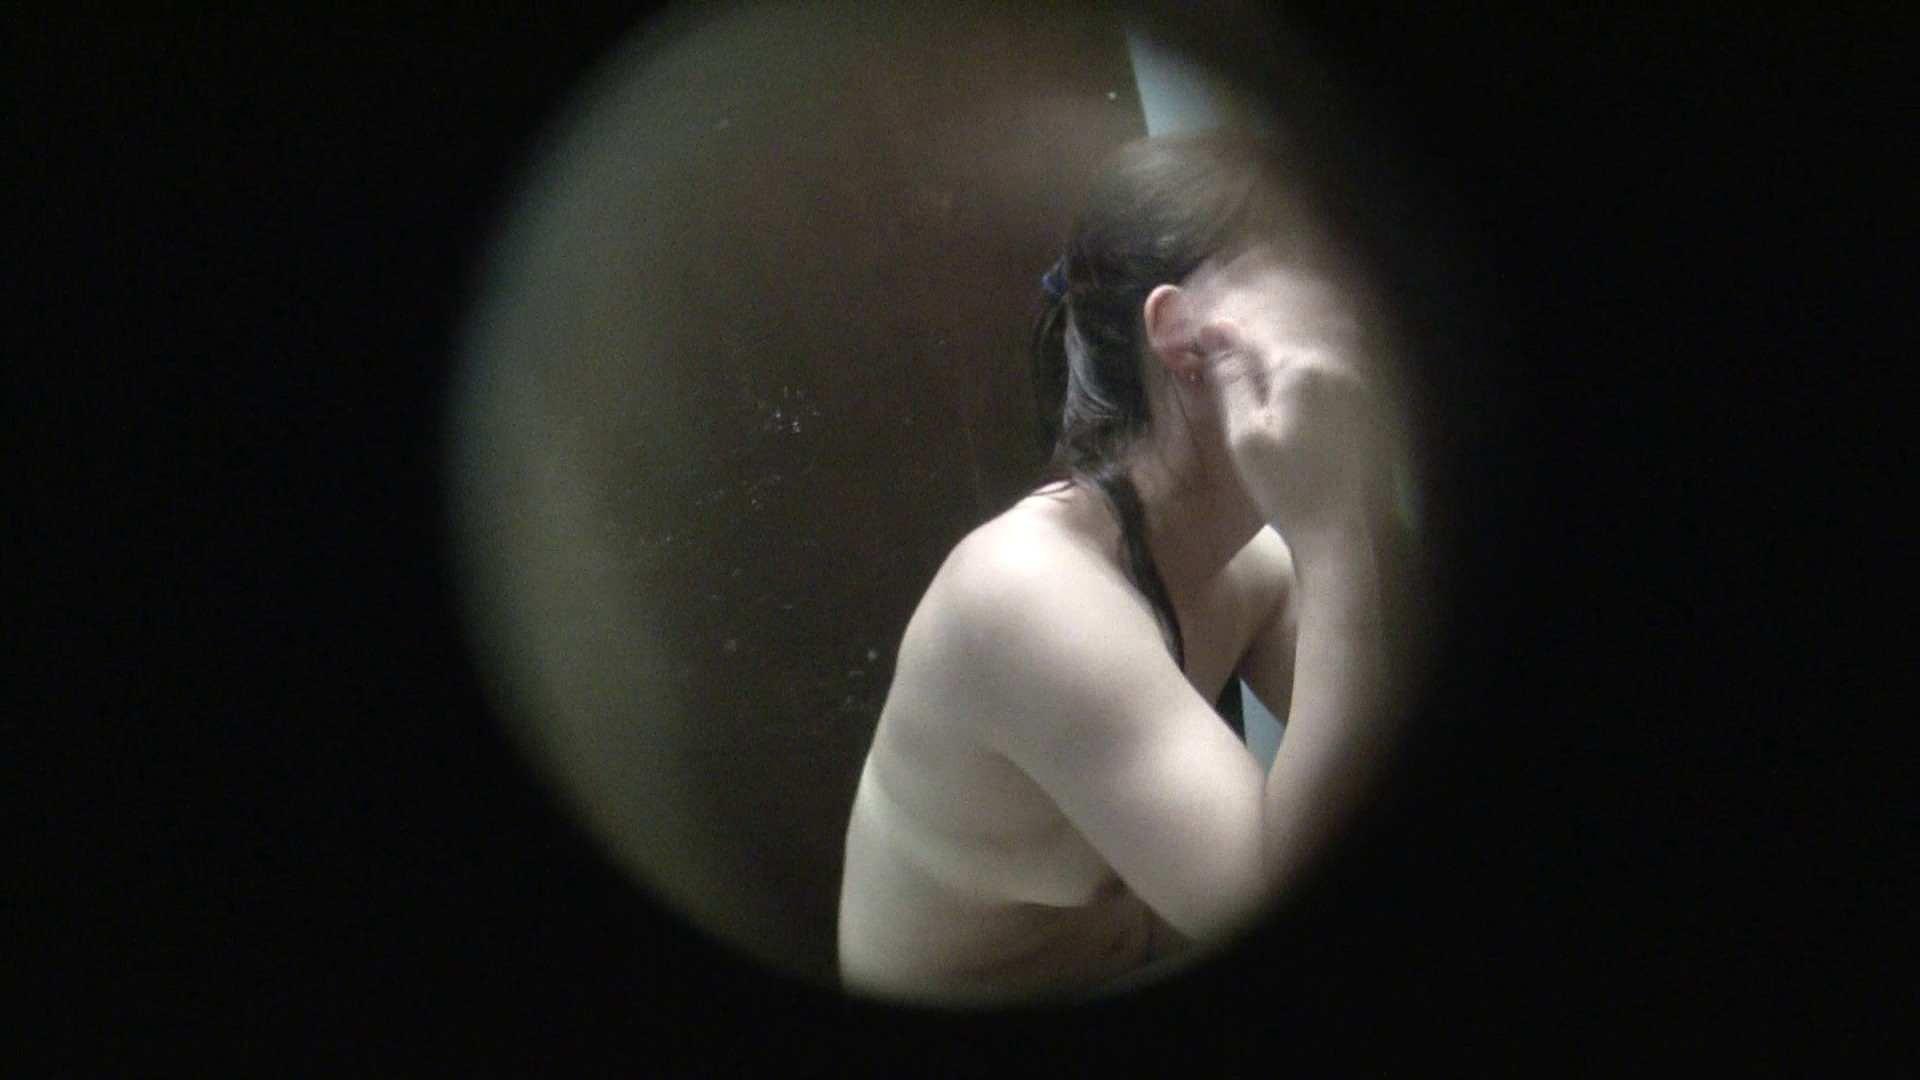 NO.01 胃下垂気味のへそピアスギャル 美乳 おまんこ無修正動画無料 58画像 51